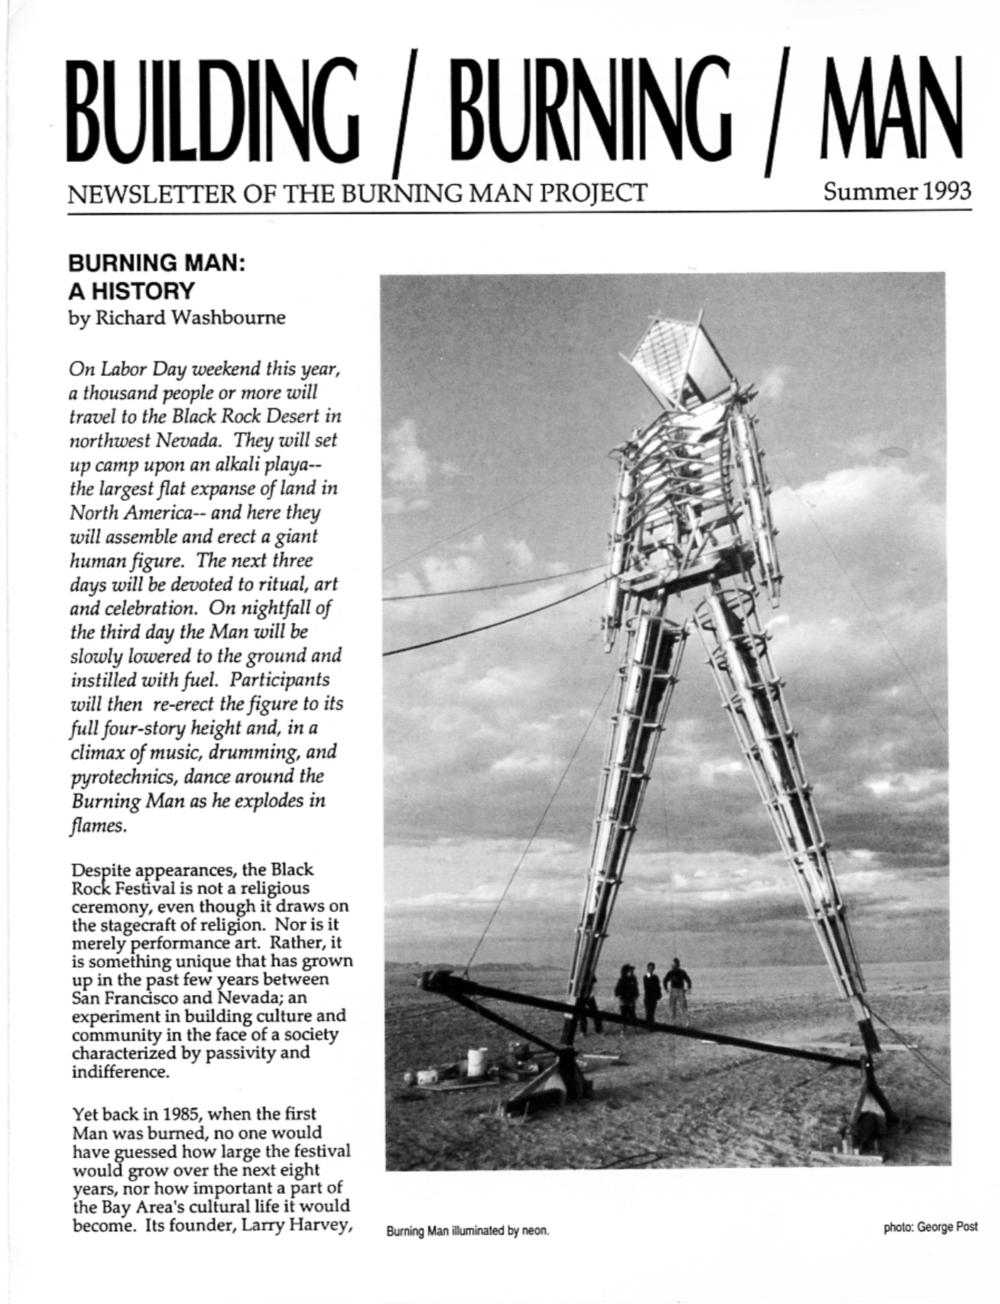 1993 Building Burning Man Magazine - $40 donation described